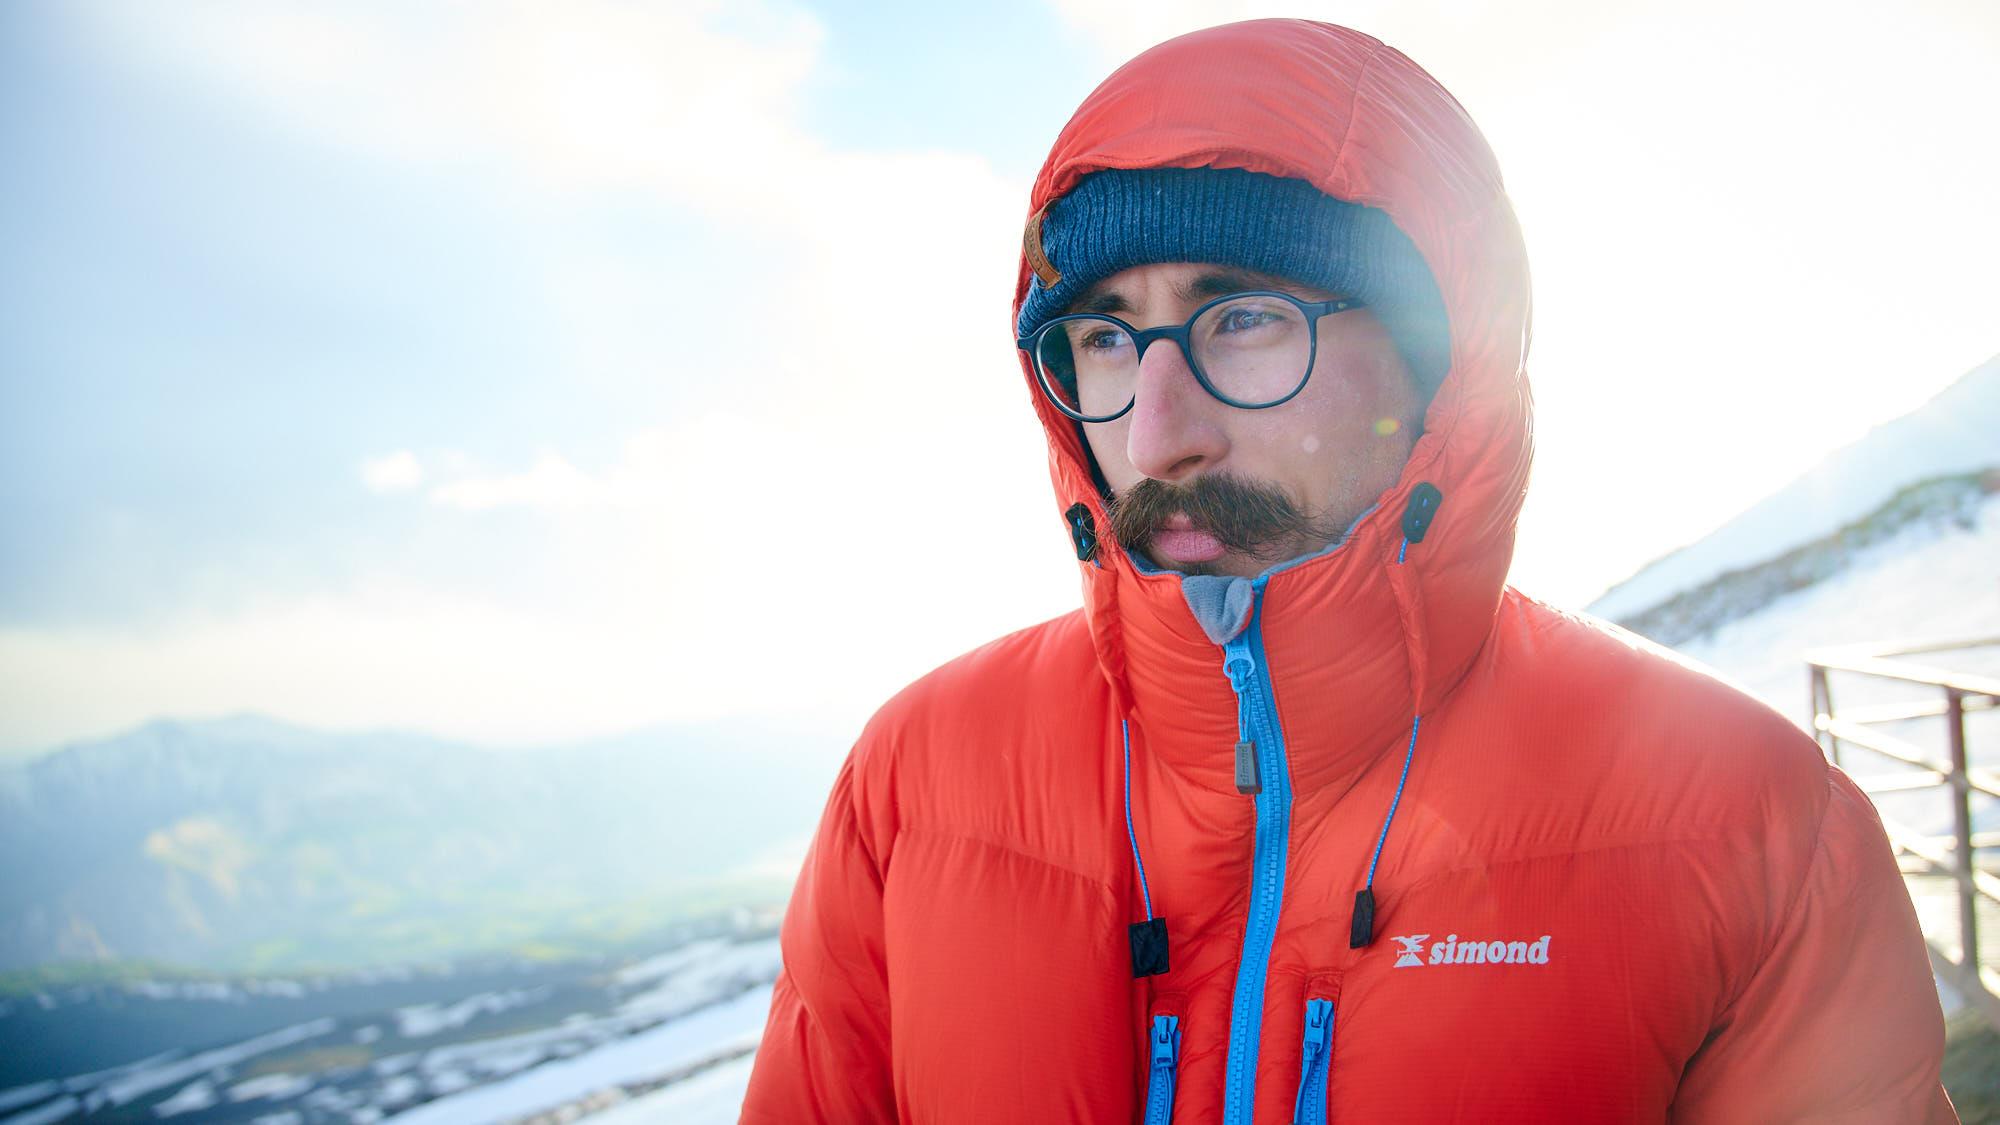 Mountaineer wearing down jacket in Mount Damavand high camp